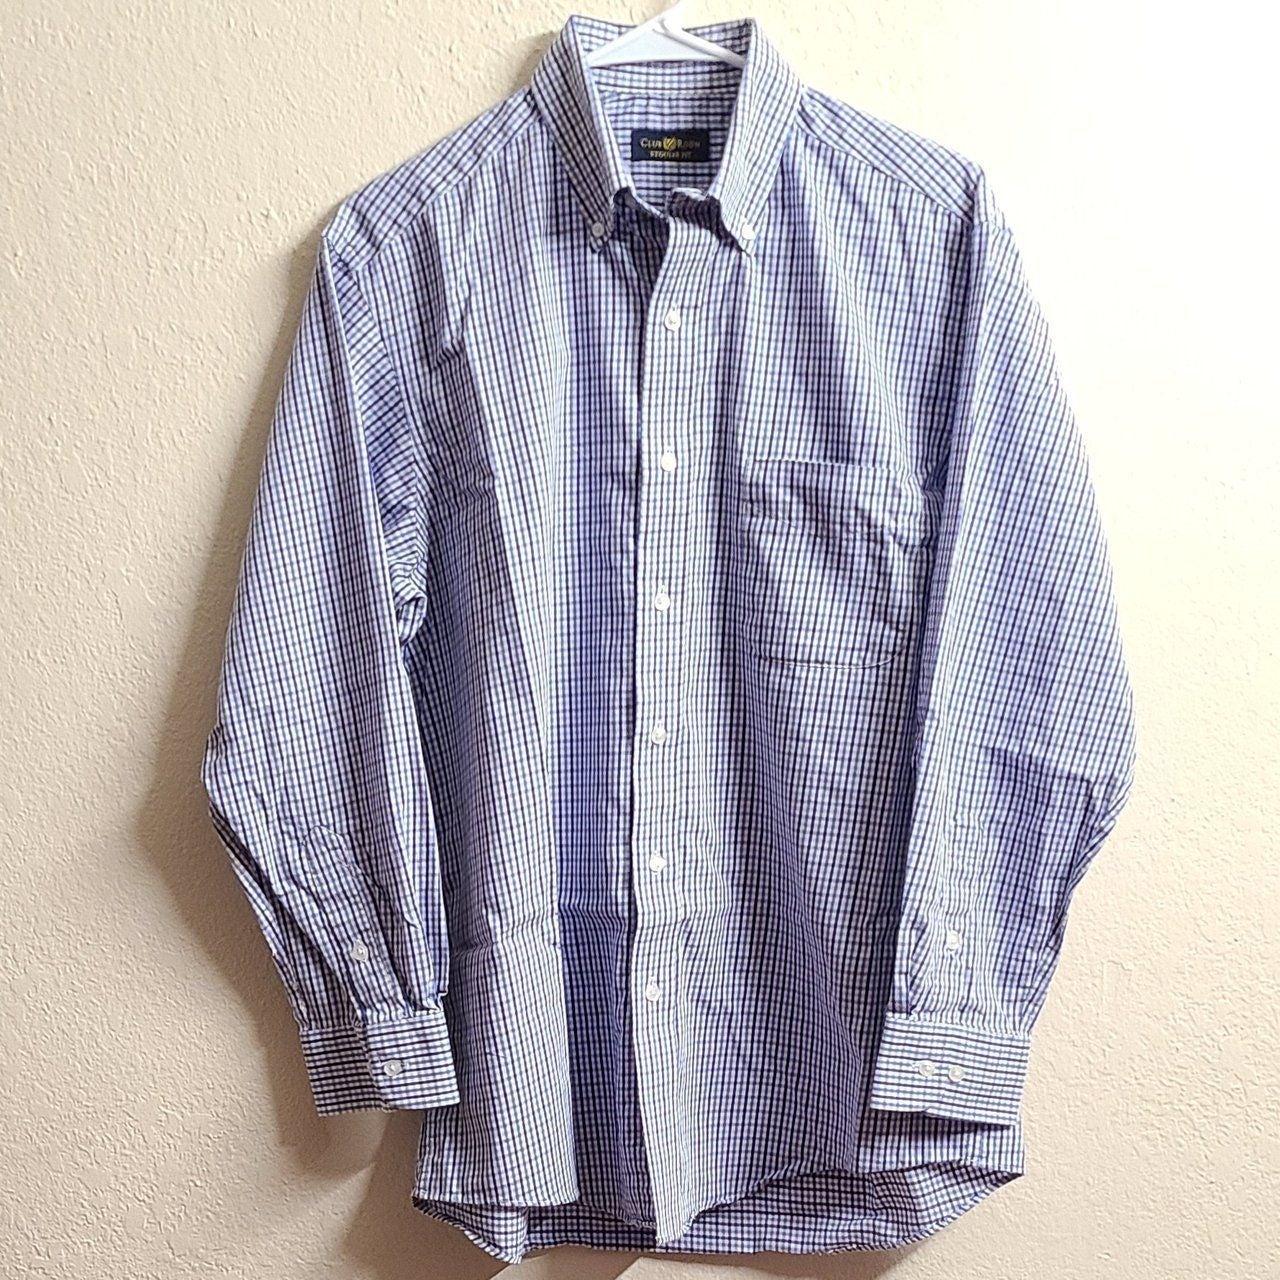 CLUB ROOM BUTTON DRESS SHIRT